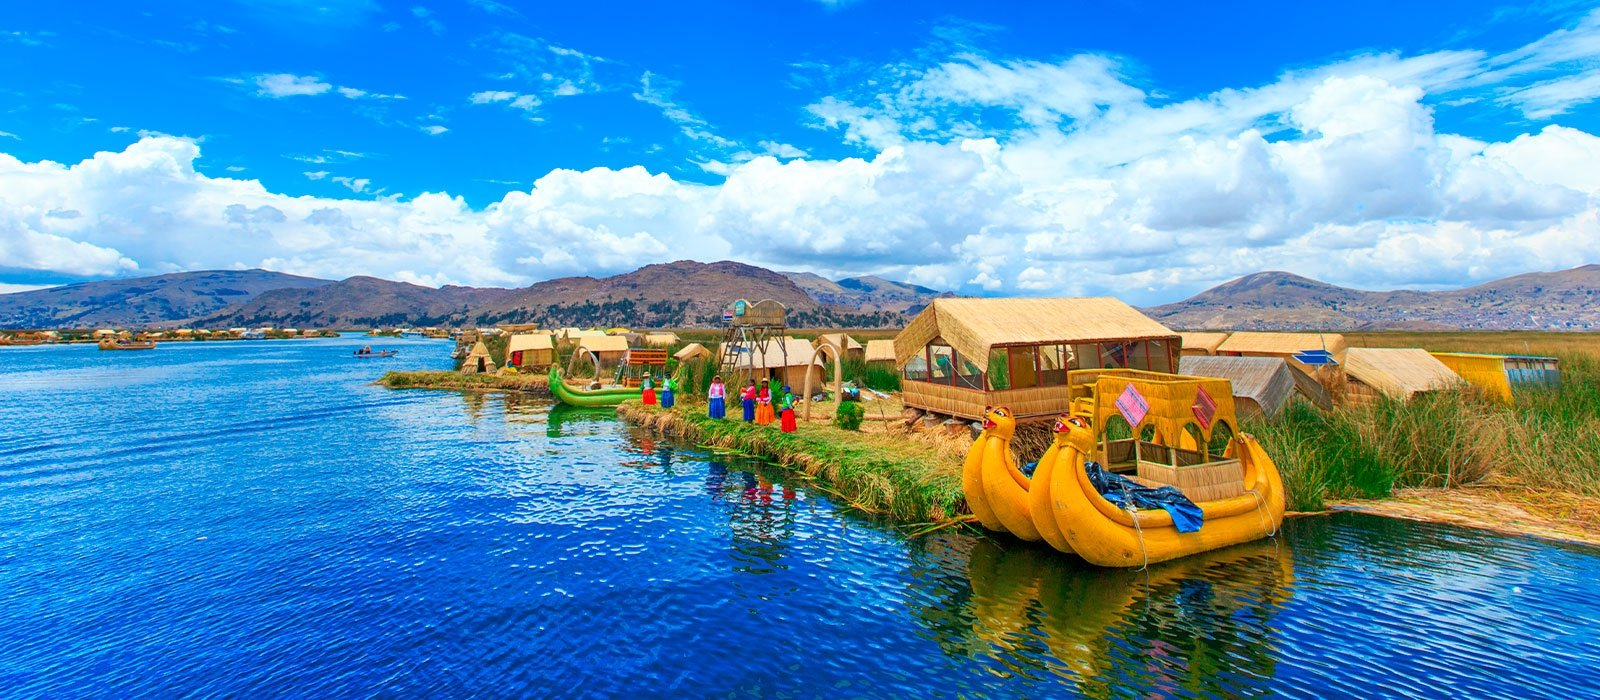 Islands of Lake Titicaca (Uros, Taquile & Amantani)